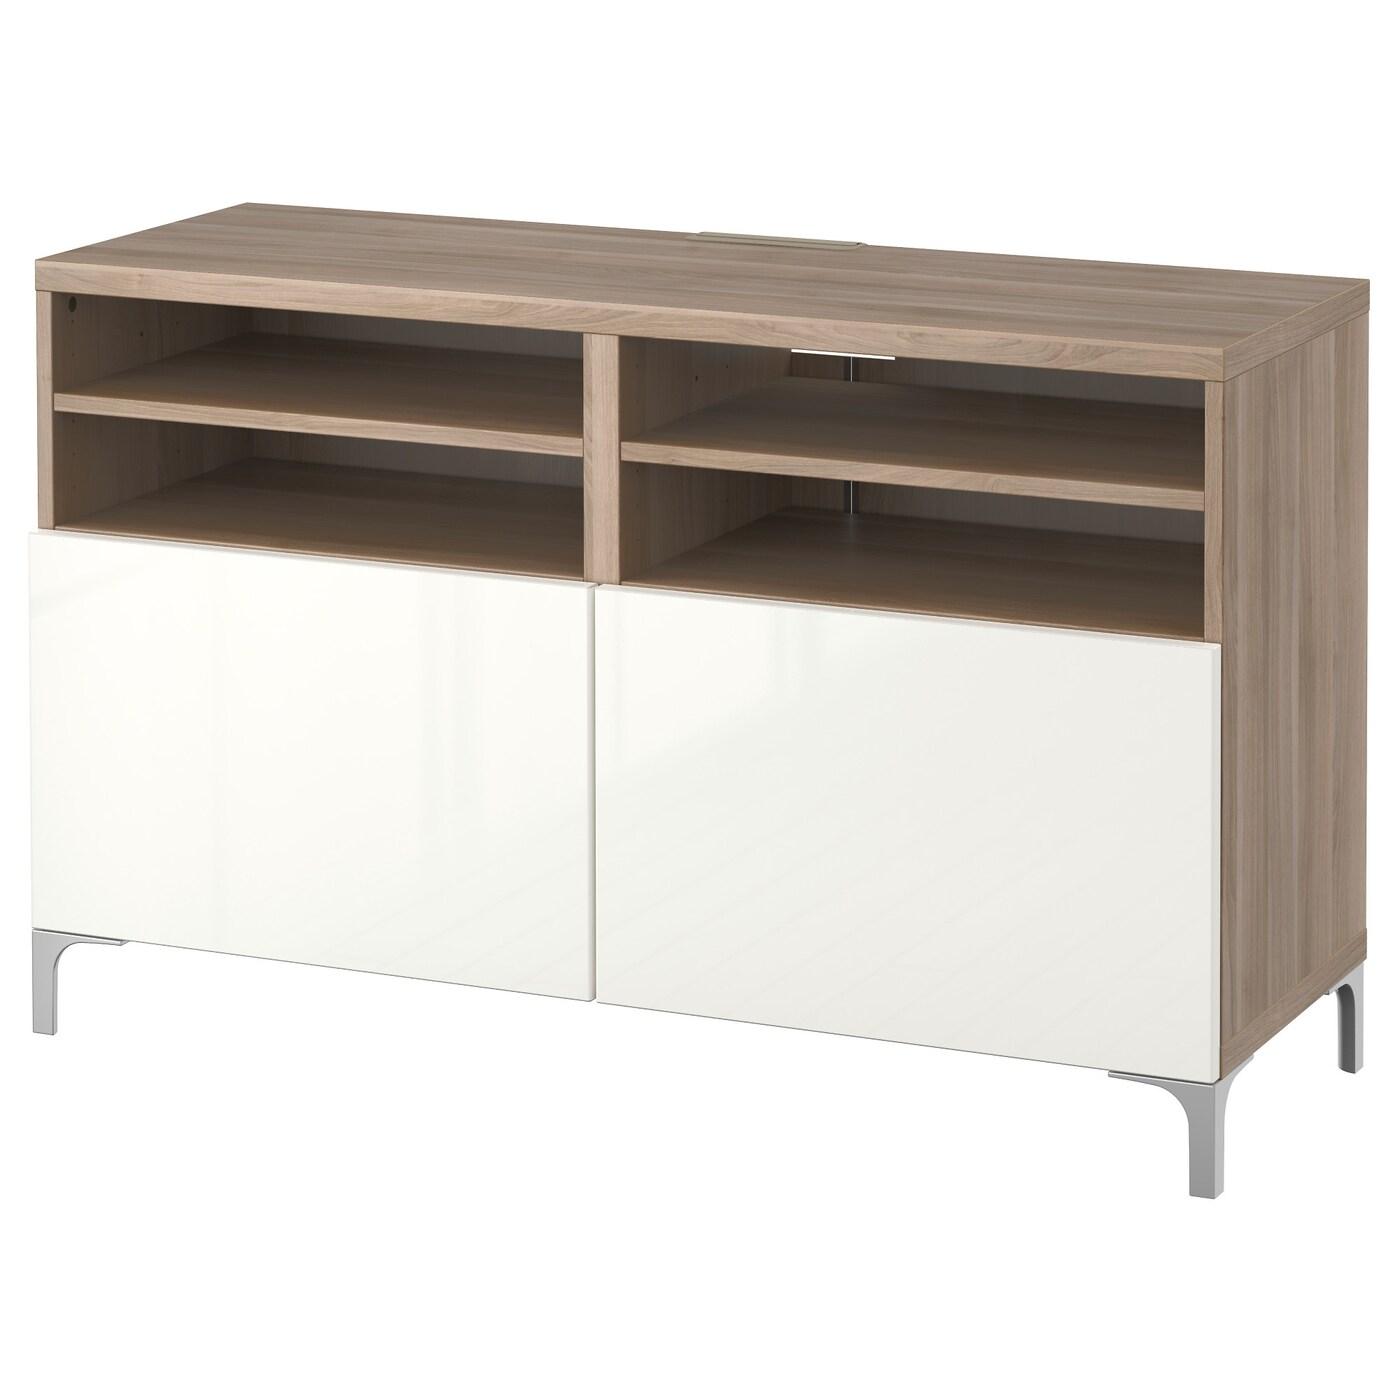 Best mueble tv con almacenaje efecto nogal tinte gris for Mueble salon blanco ikea